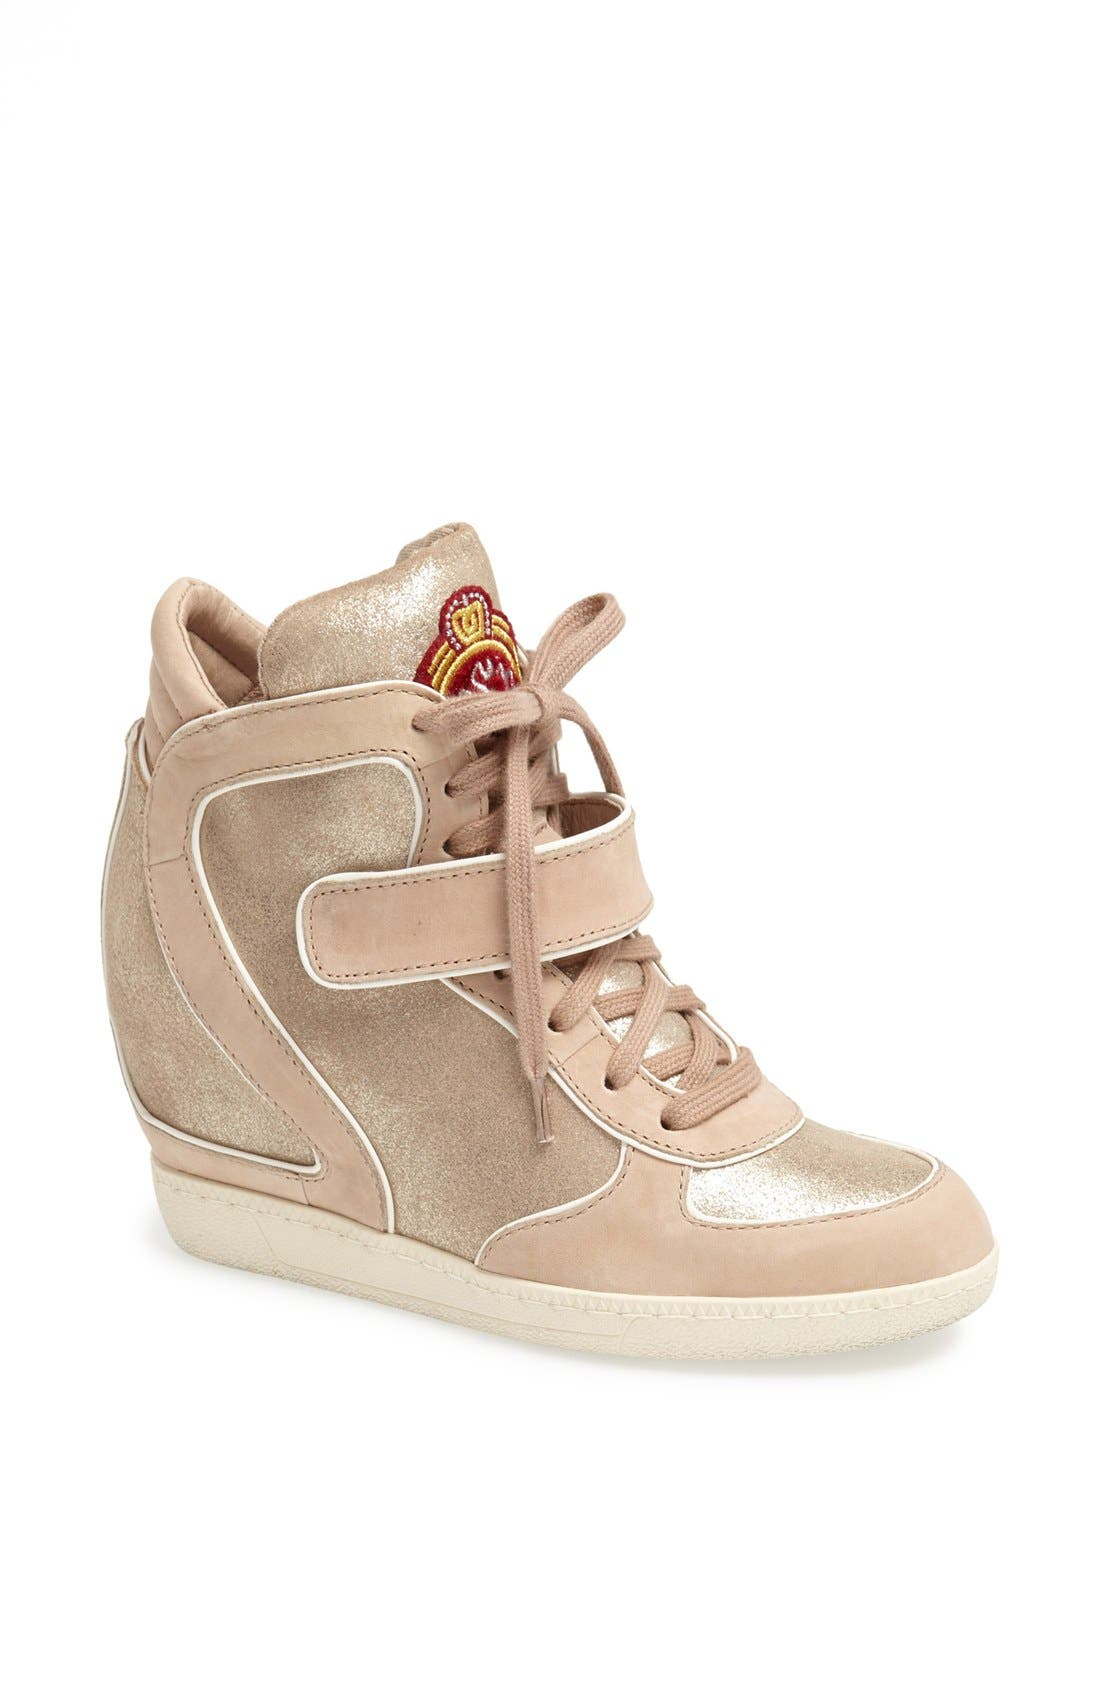 Main Image - Ash 'Brendy' Hidden Wedge Suede & Metallic Leather Sneaker